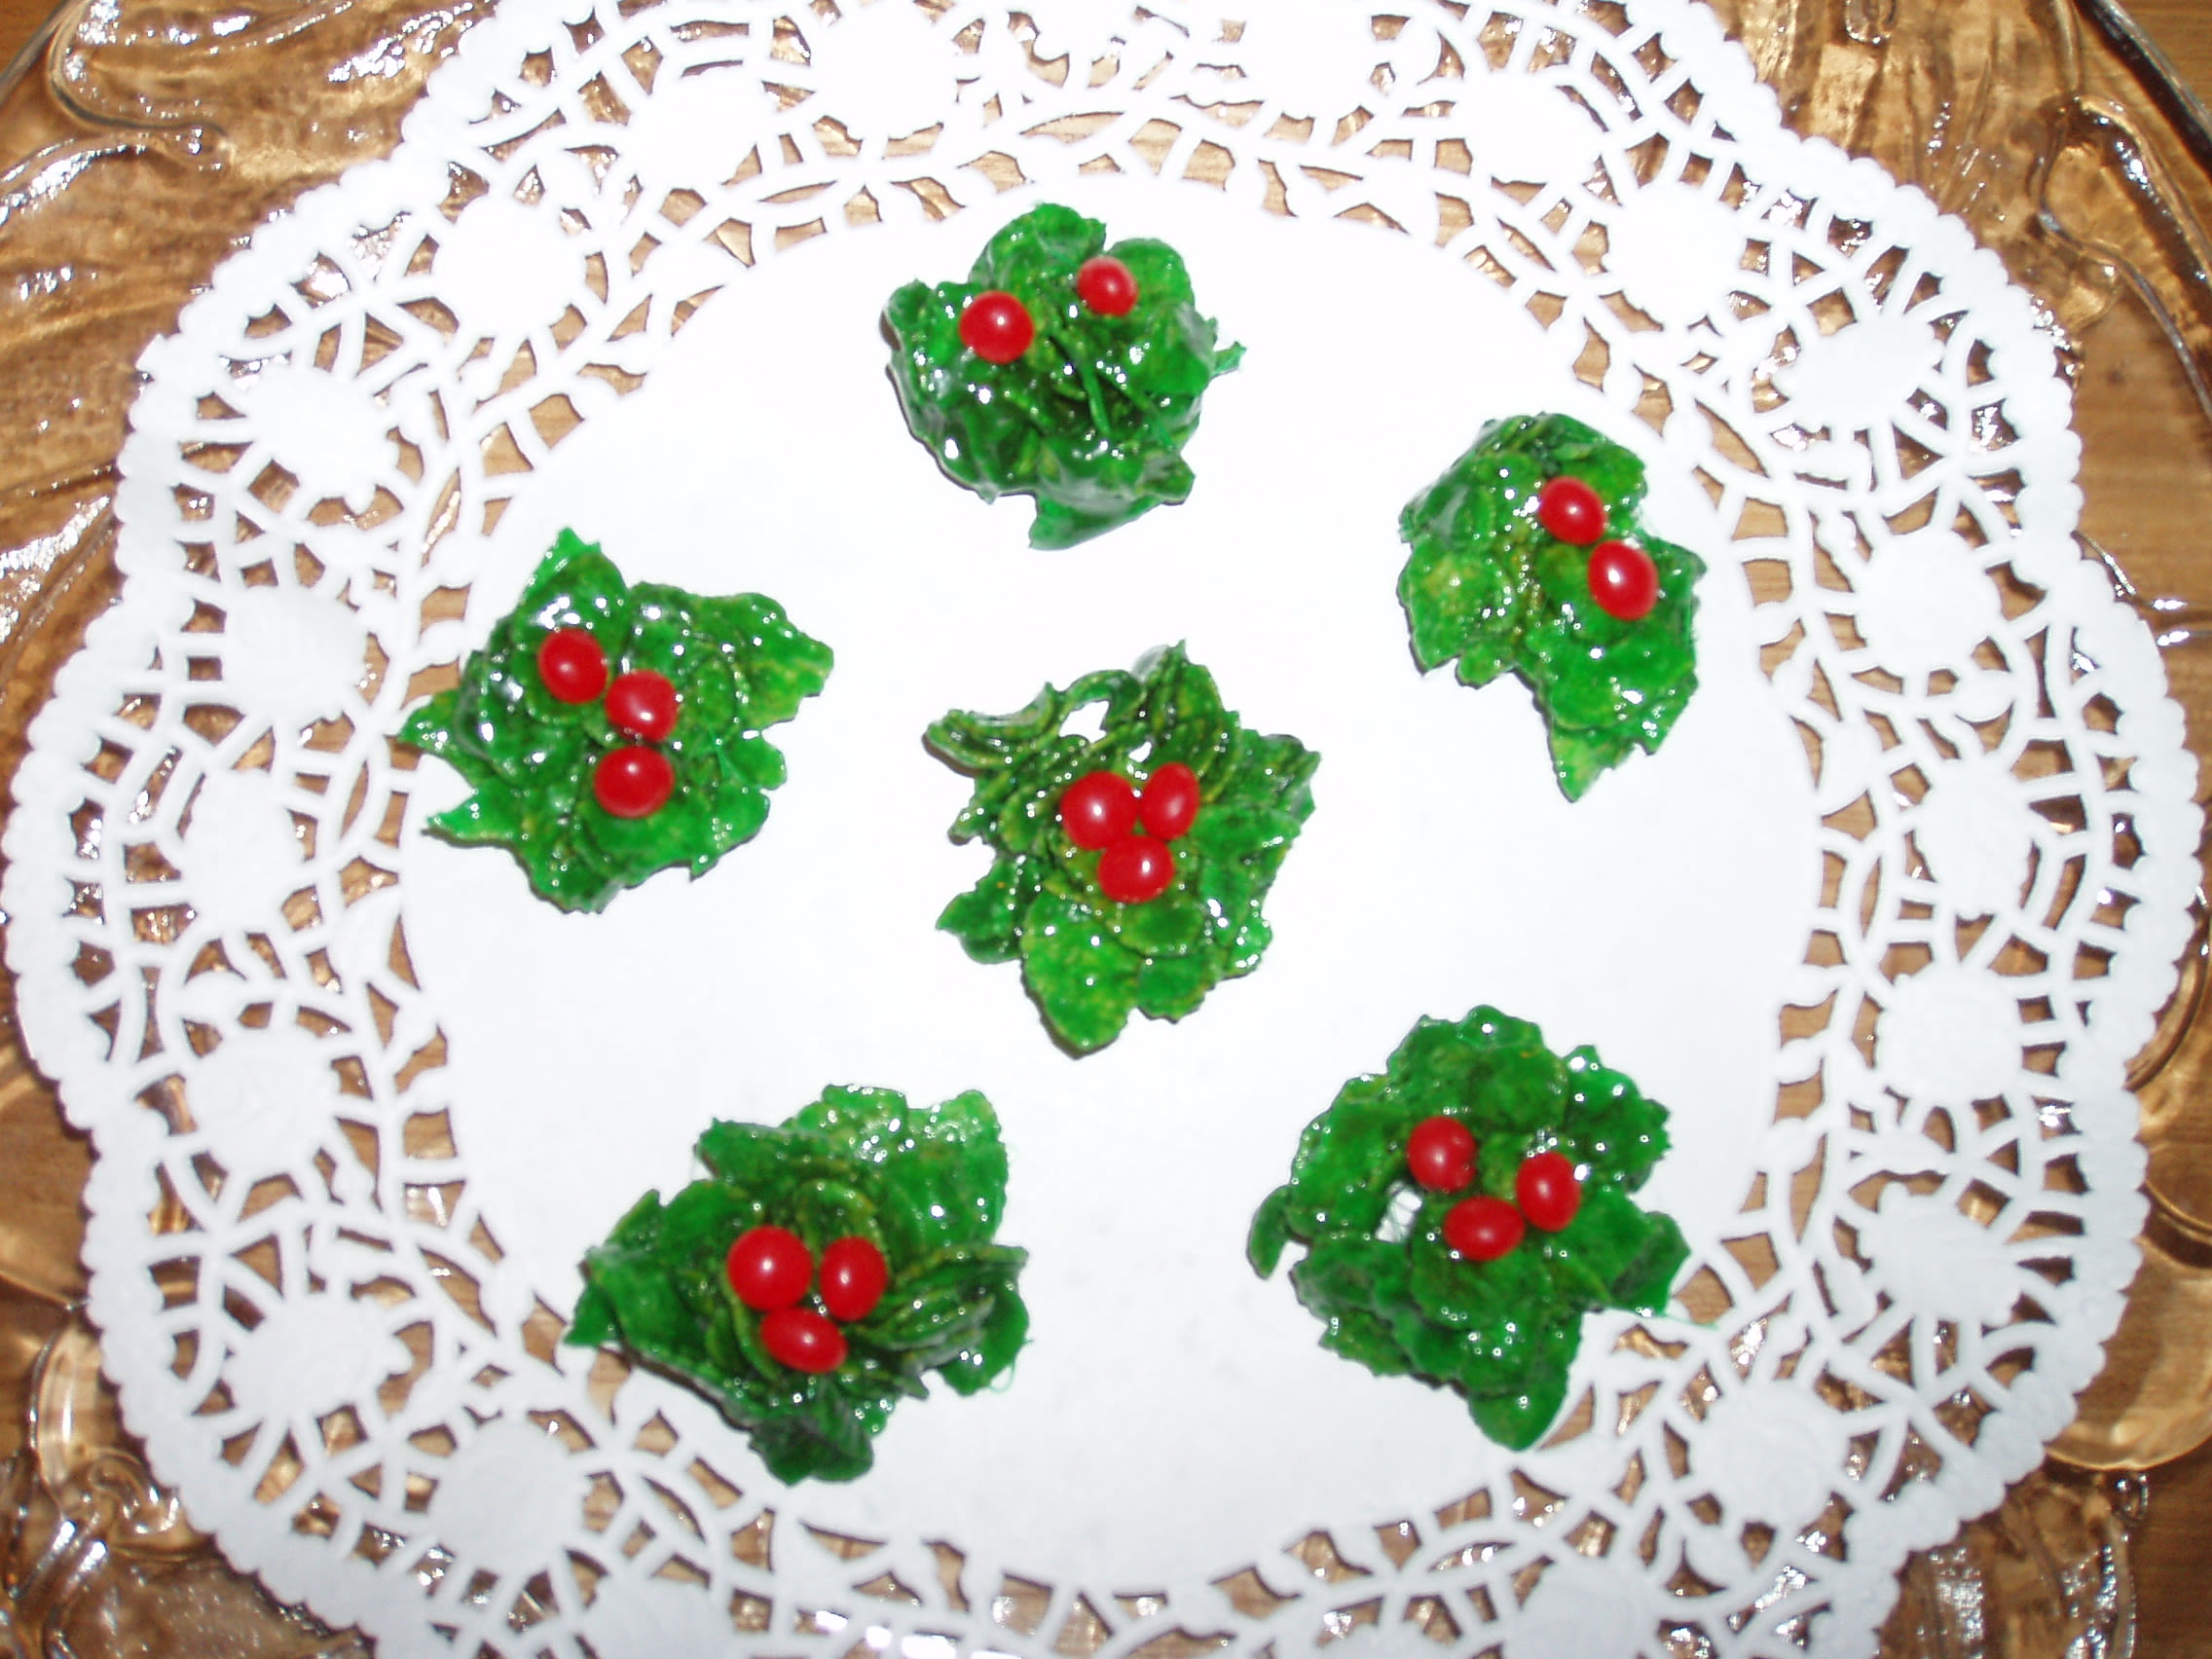 Holly Christmas Cookies Recipe - Genius Kitchen